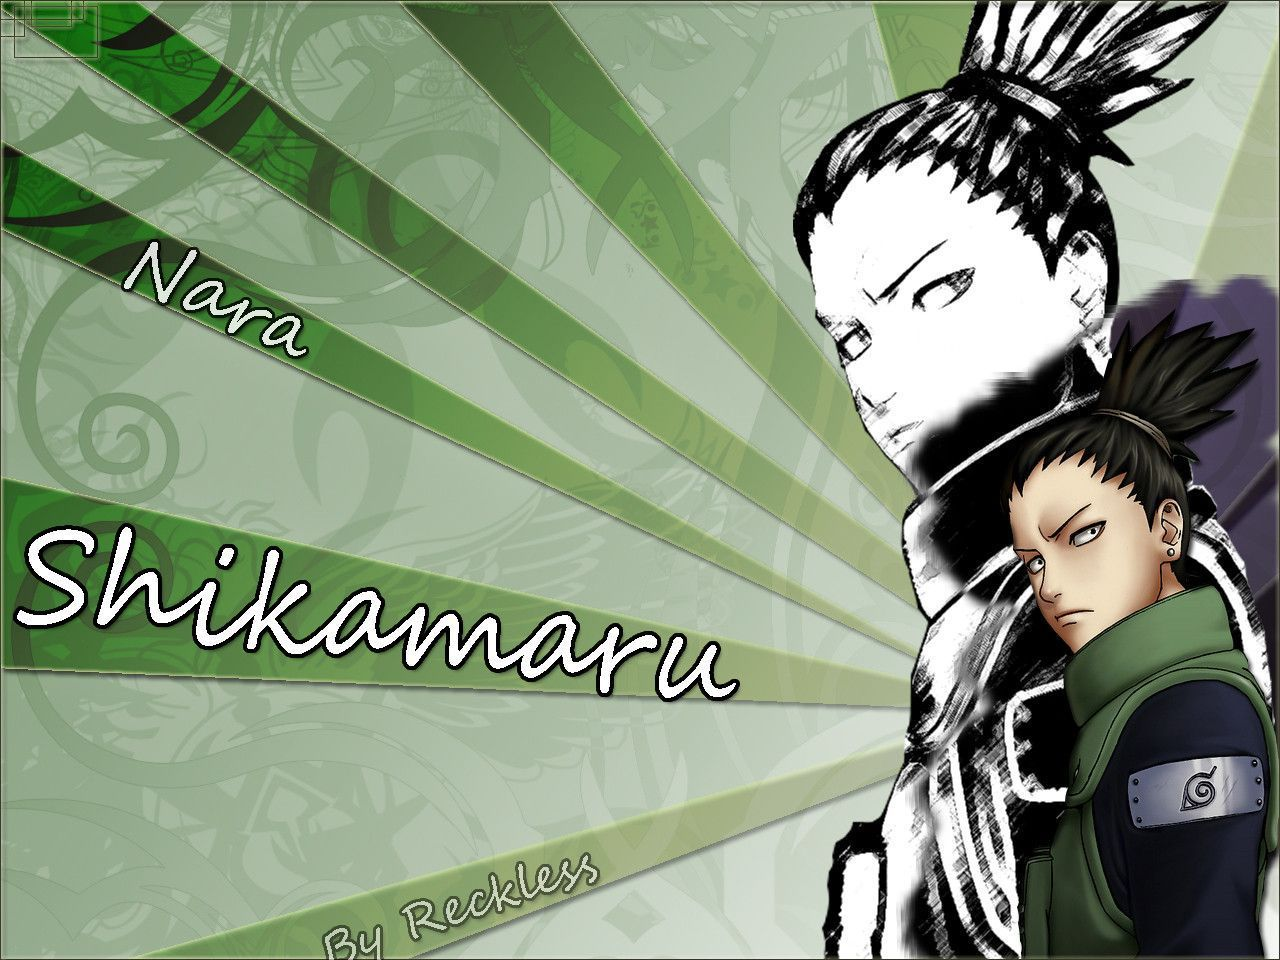 Nara shikamaru wallpapers, backgrounds, images 240x320— best nara shikamaru  desktop wallpaper